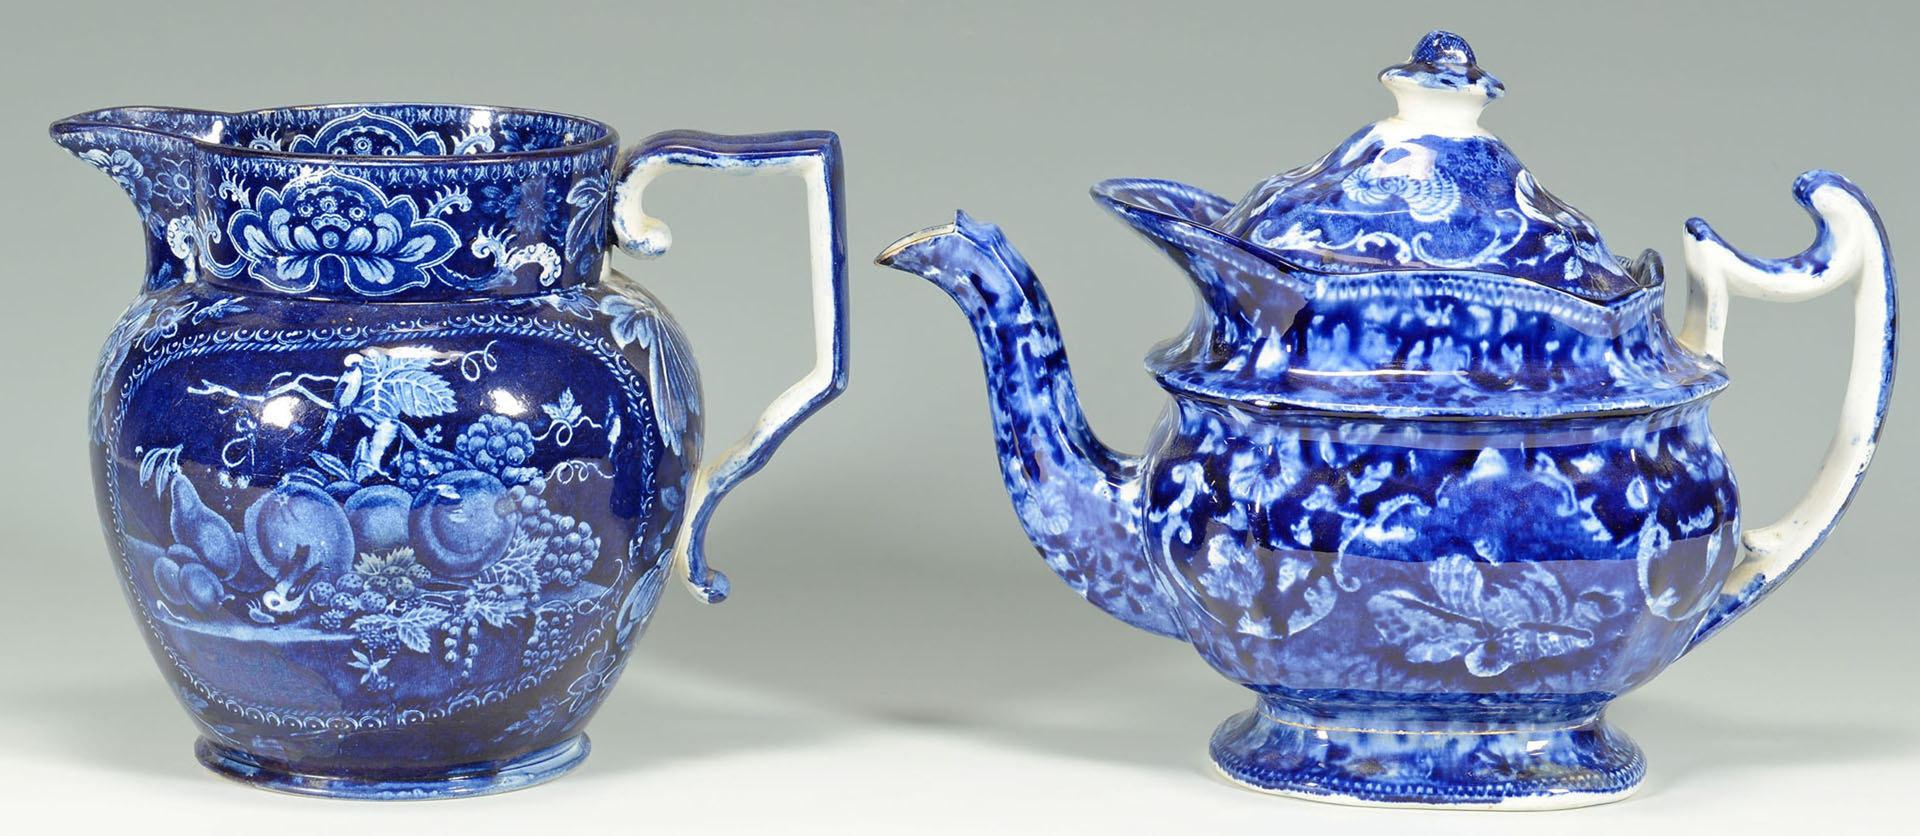 Lot 242: 10 pcs Staffordshire Blue and White Porcelain